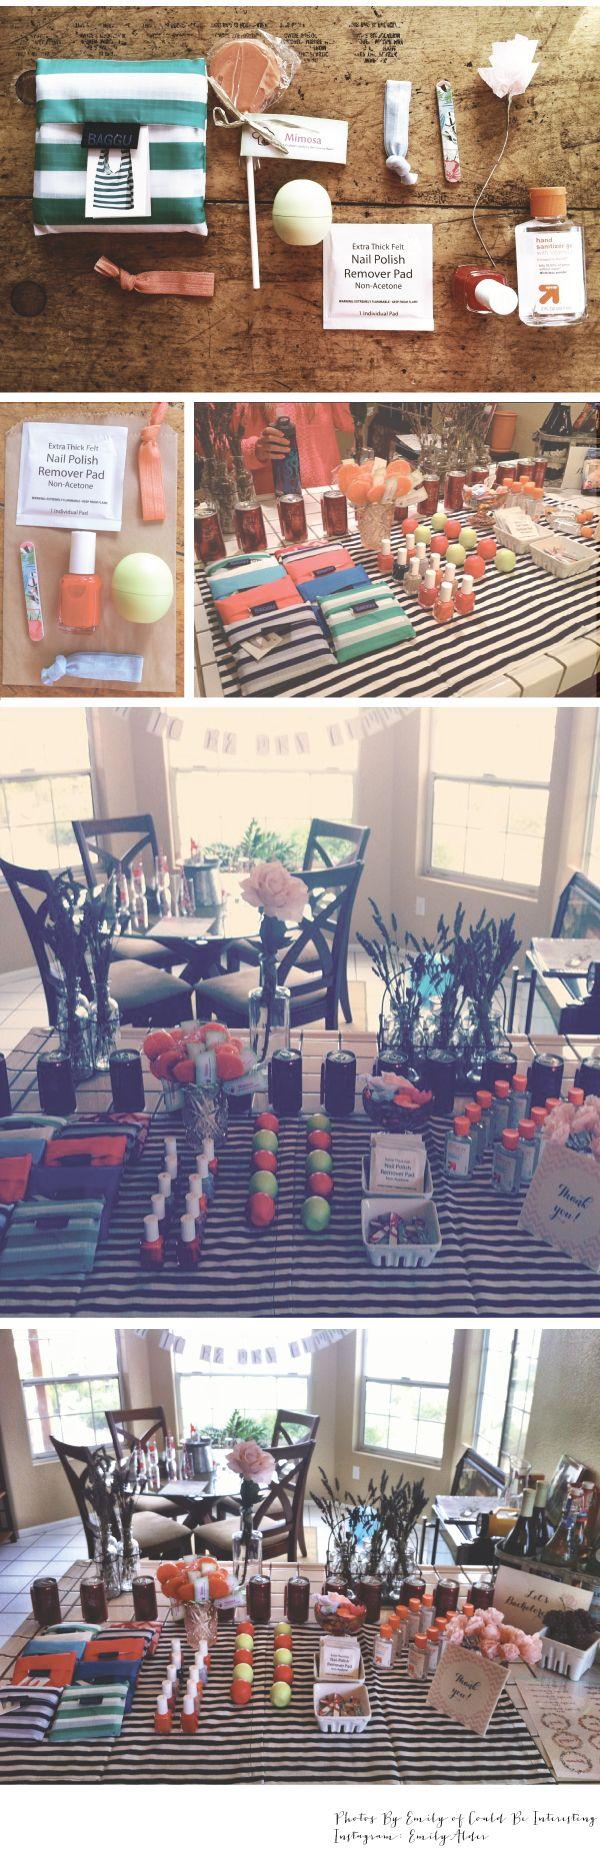 DIY Bachelorette Goodie Bags. BAGGU bags, mimosa lollipops, paper flowers, essie nail polish and more